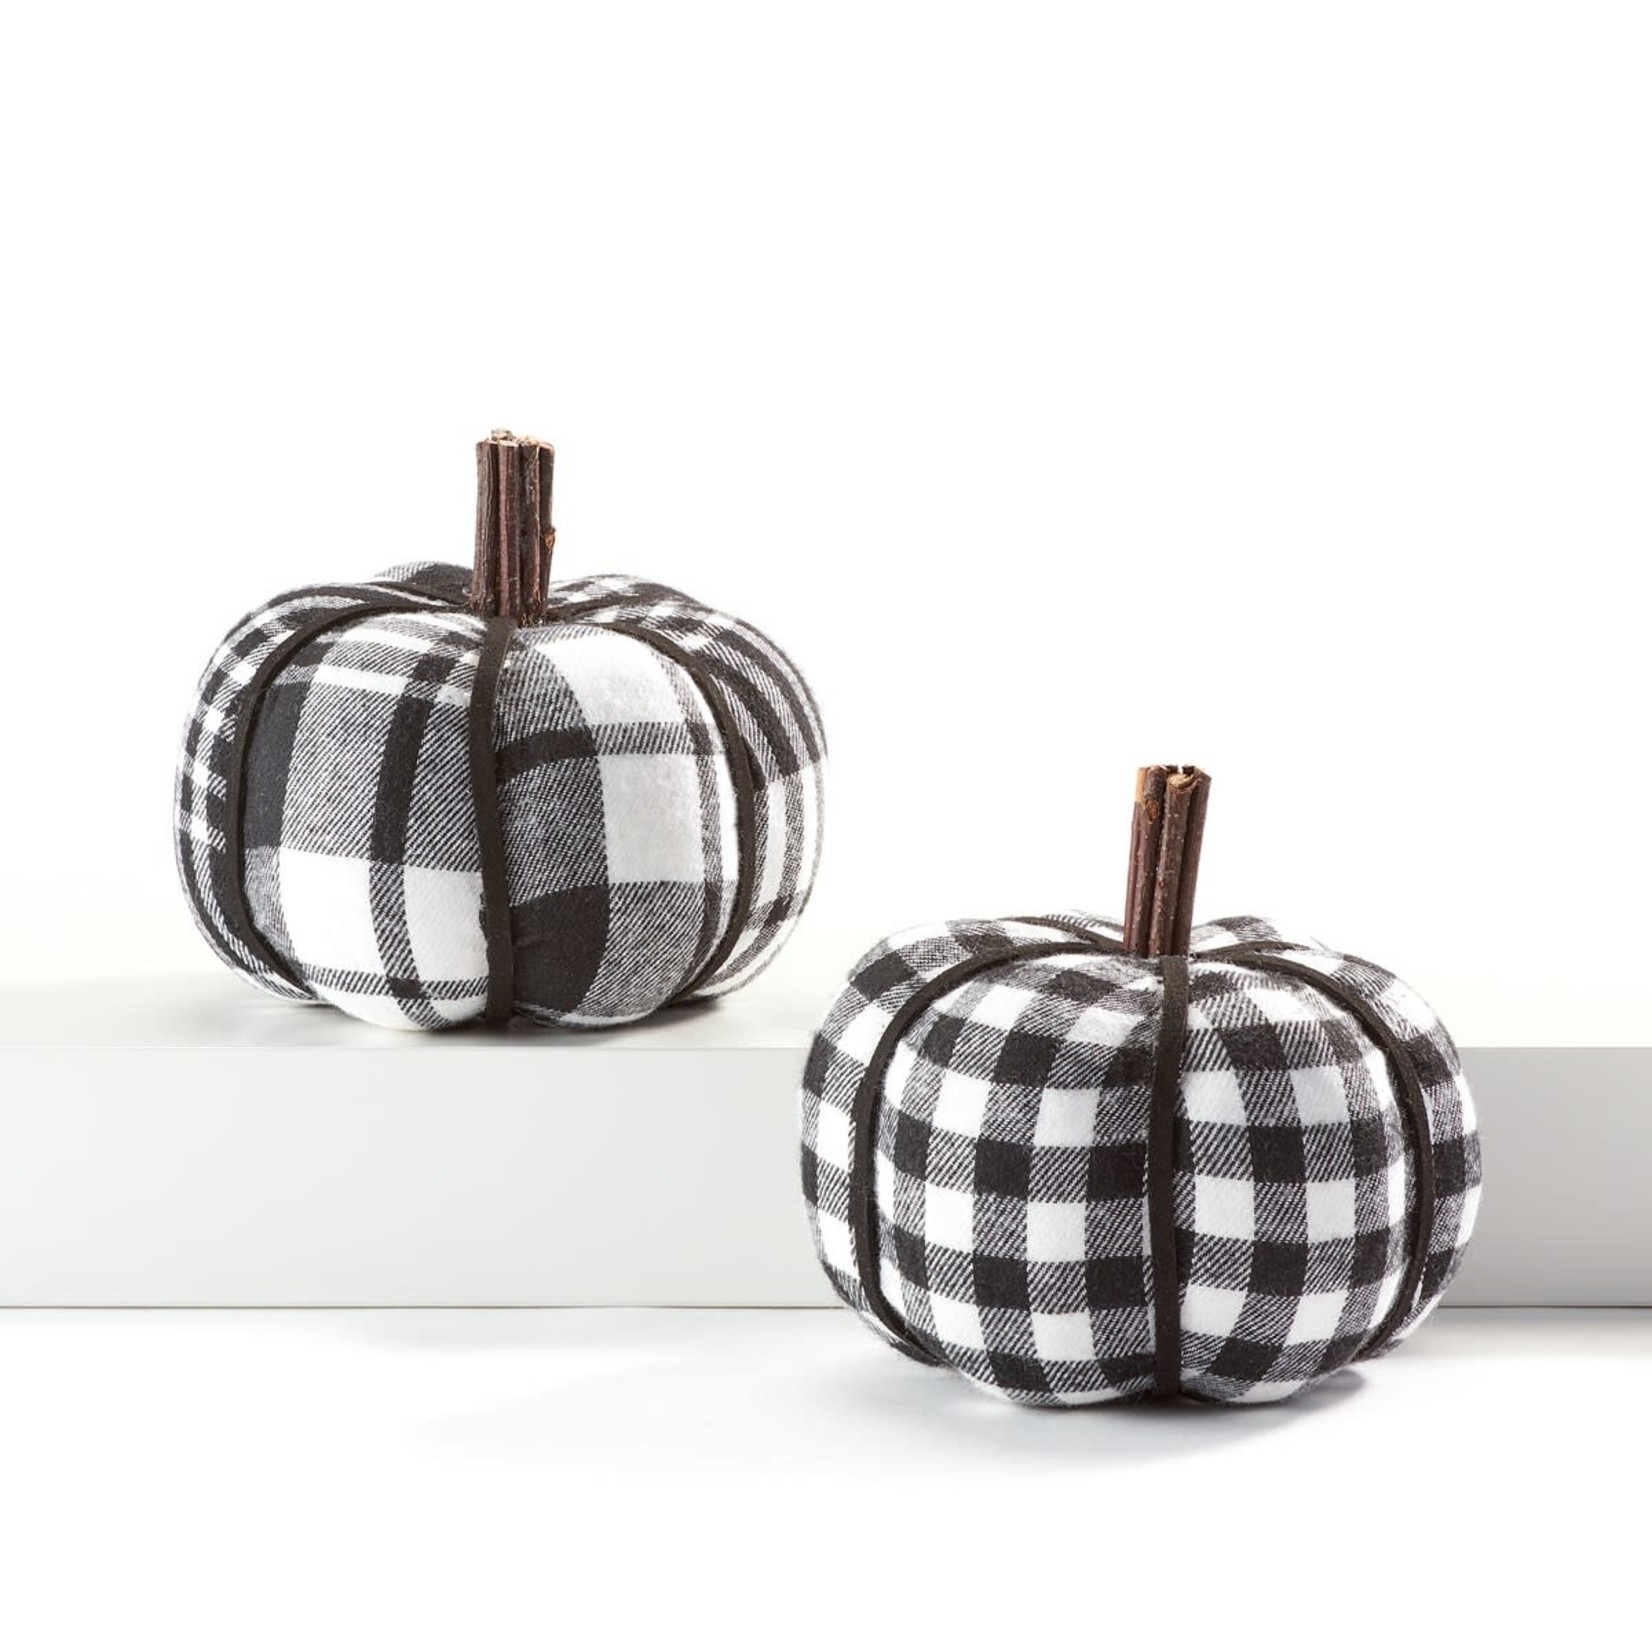 Pumpkin Decor - Small